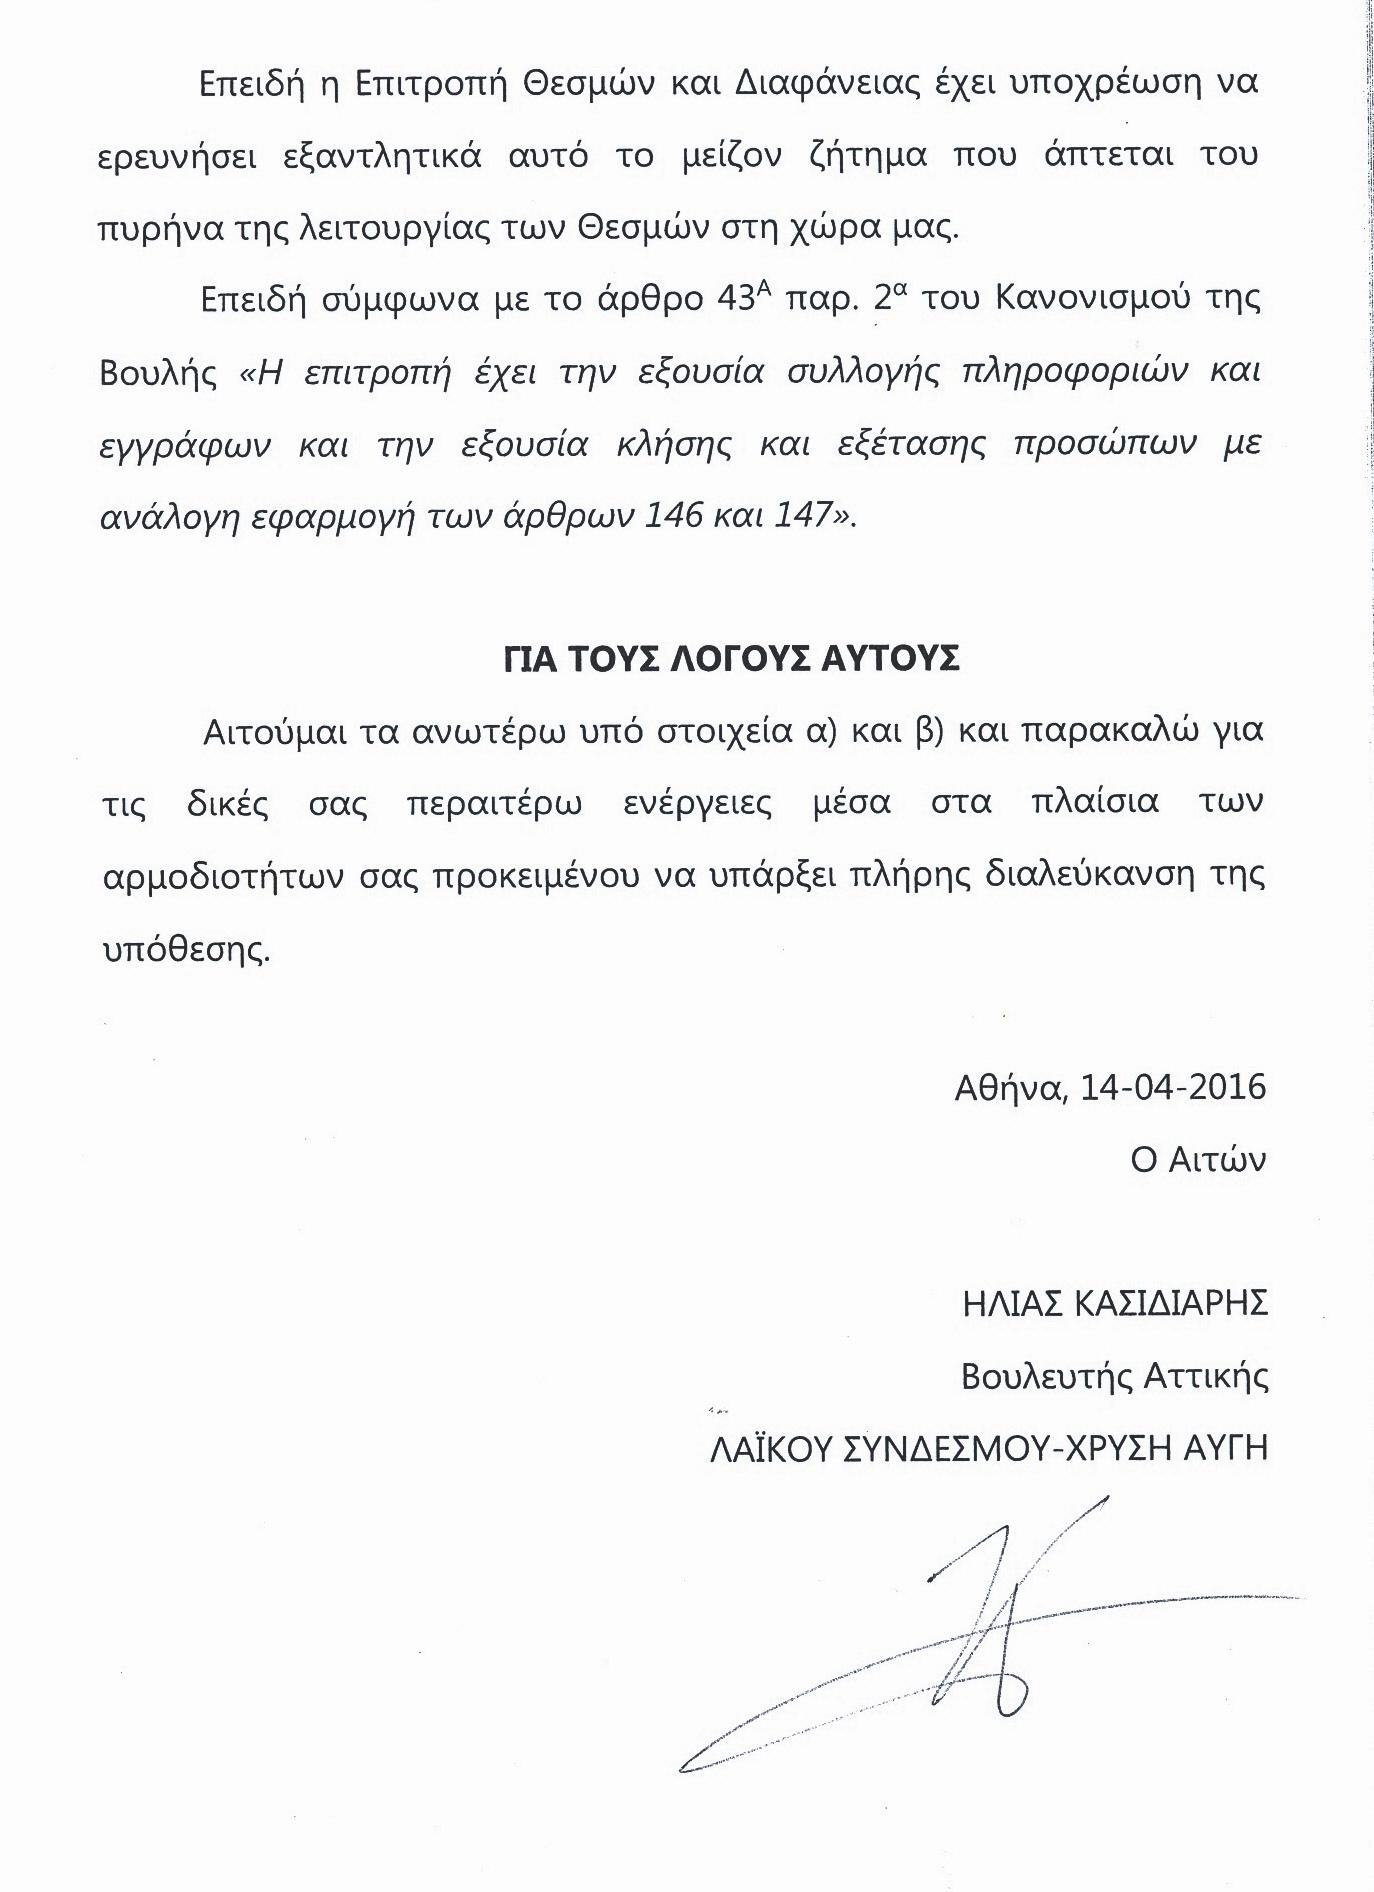 kasidiaris2